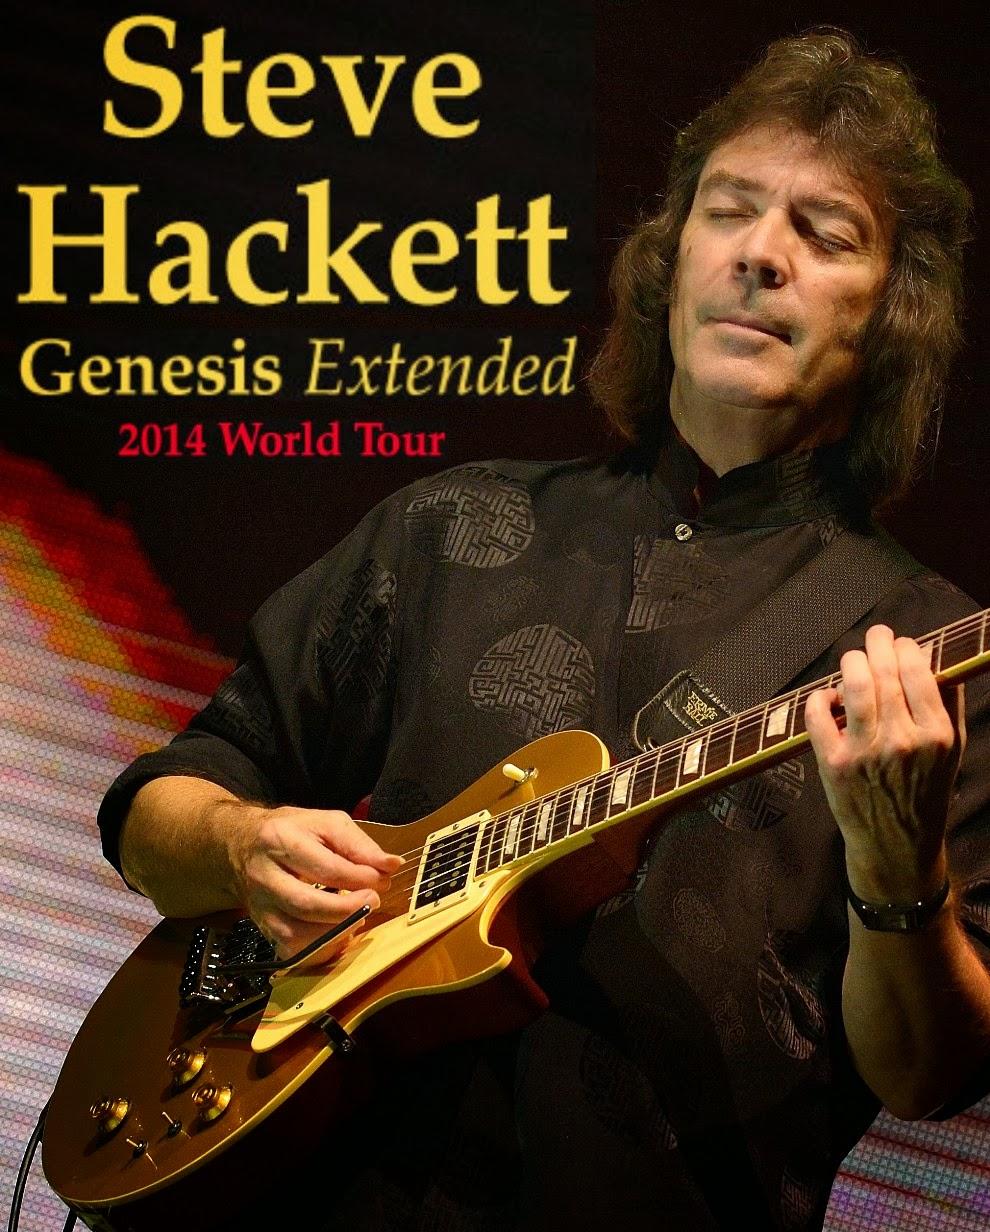 Steve Hackett torna in Italia con il Genesis Extended World Tour